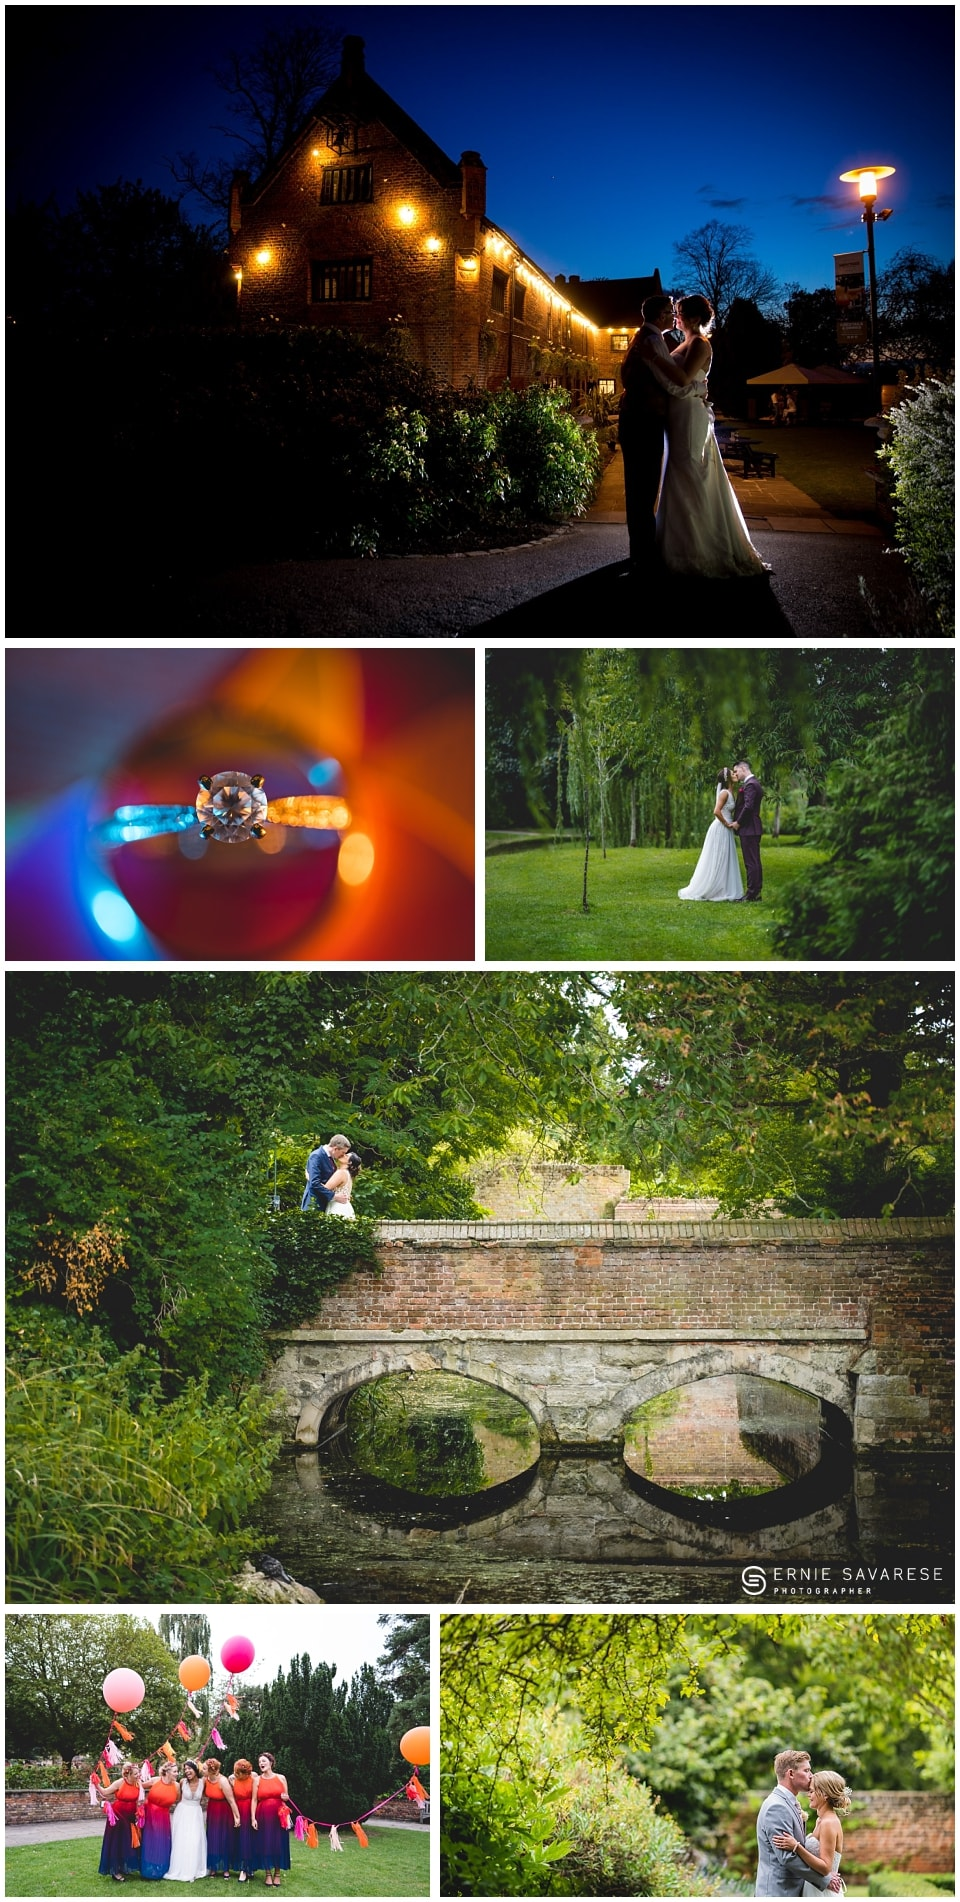 Small Wedding Photography Intimate Wedding Photographer London - Tudor Barn